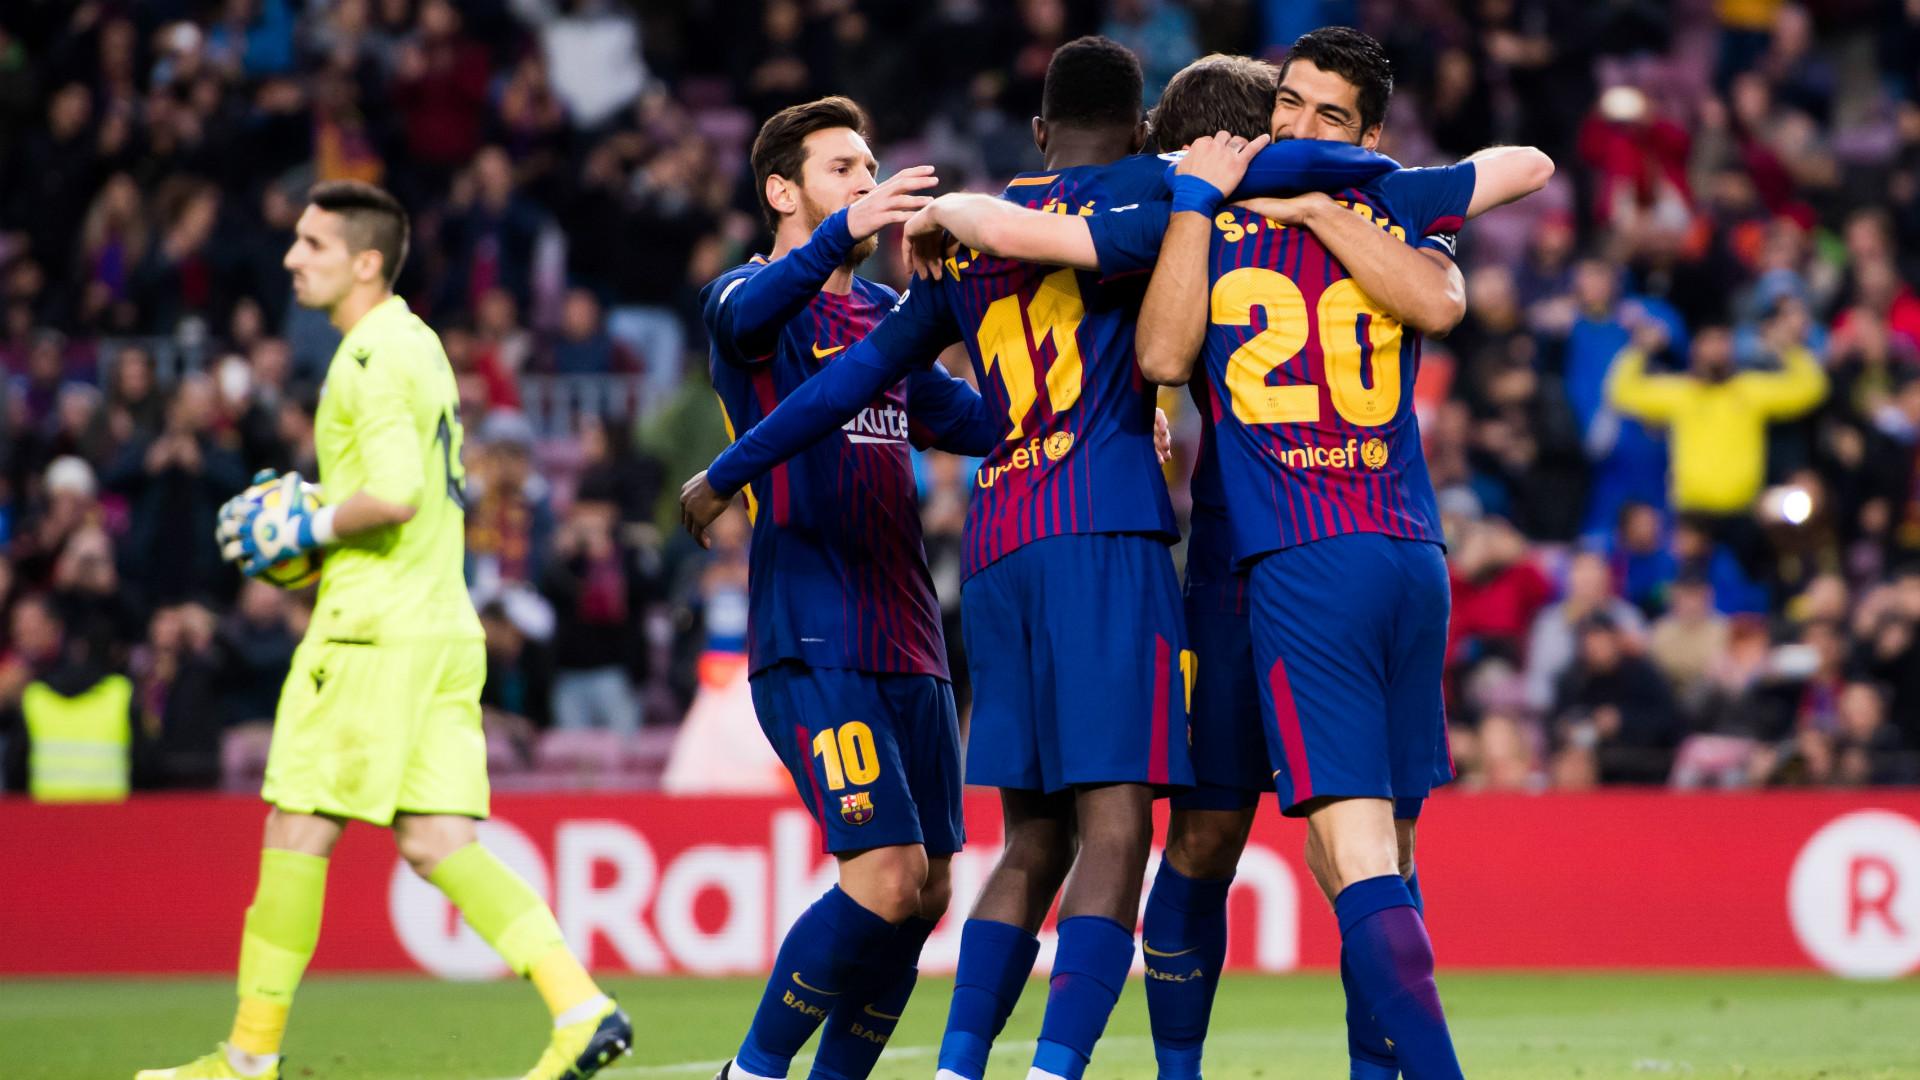 barcelona spiel heute live stream